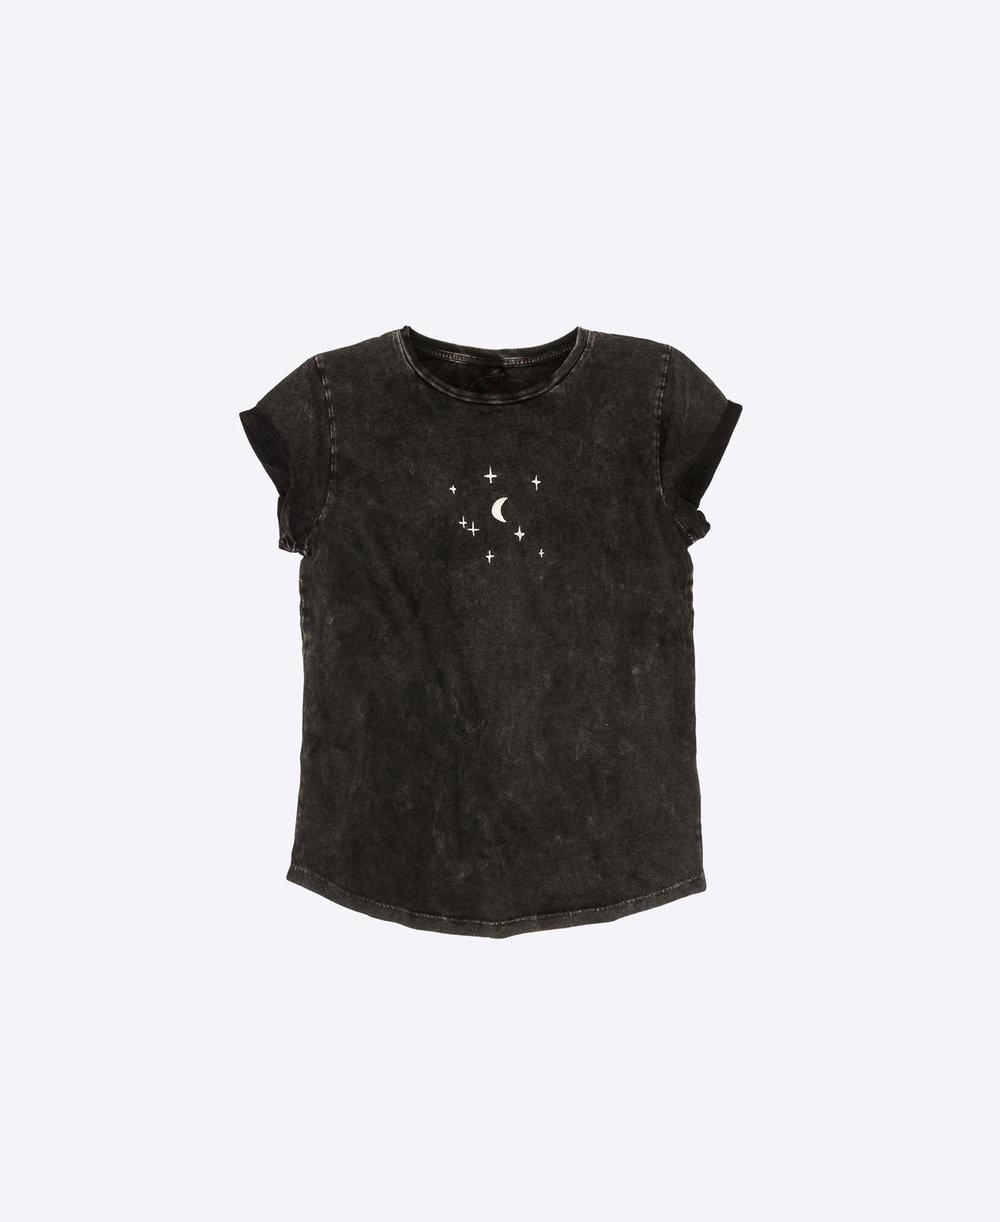 acid-embroidery-stars-t-shirt-versie-b.jpg